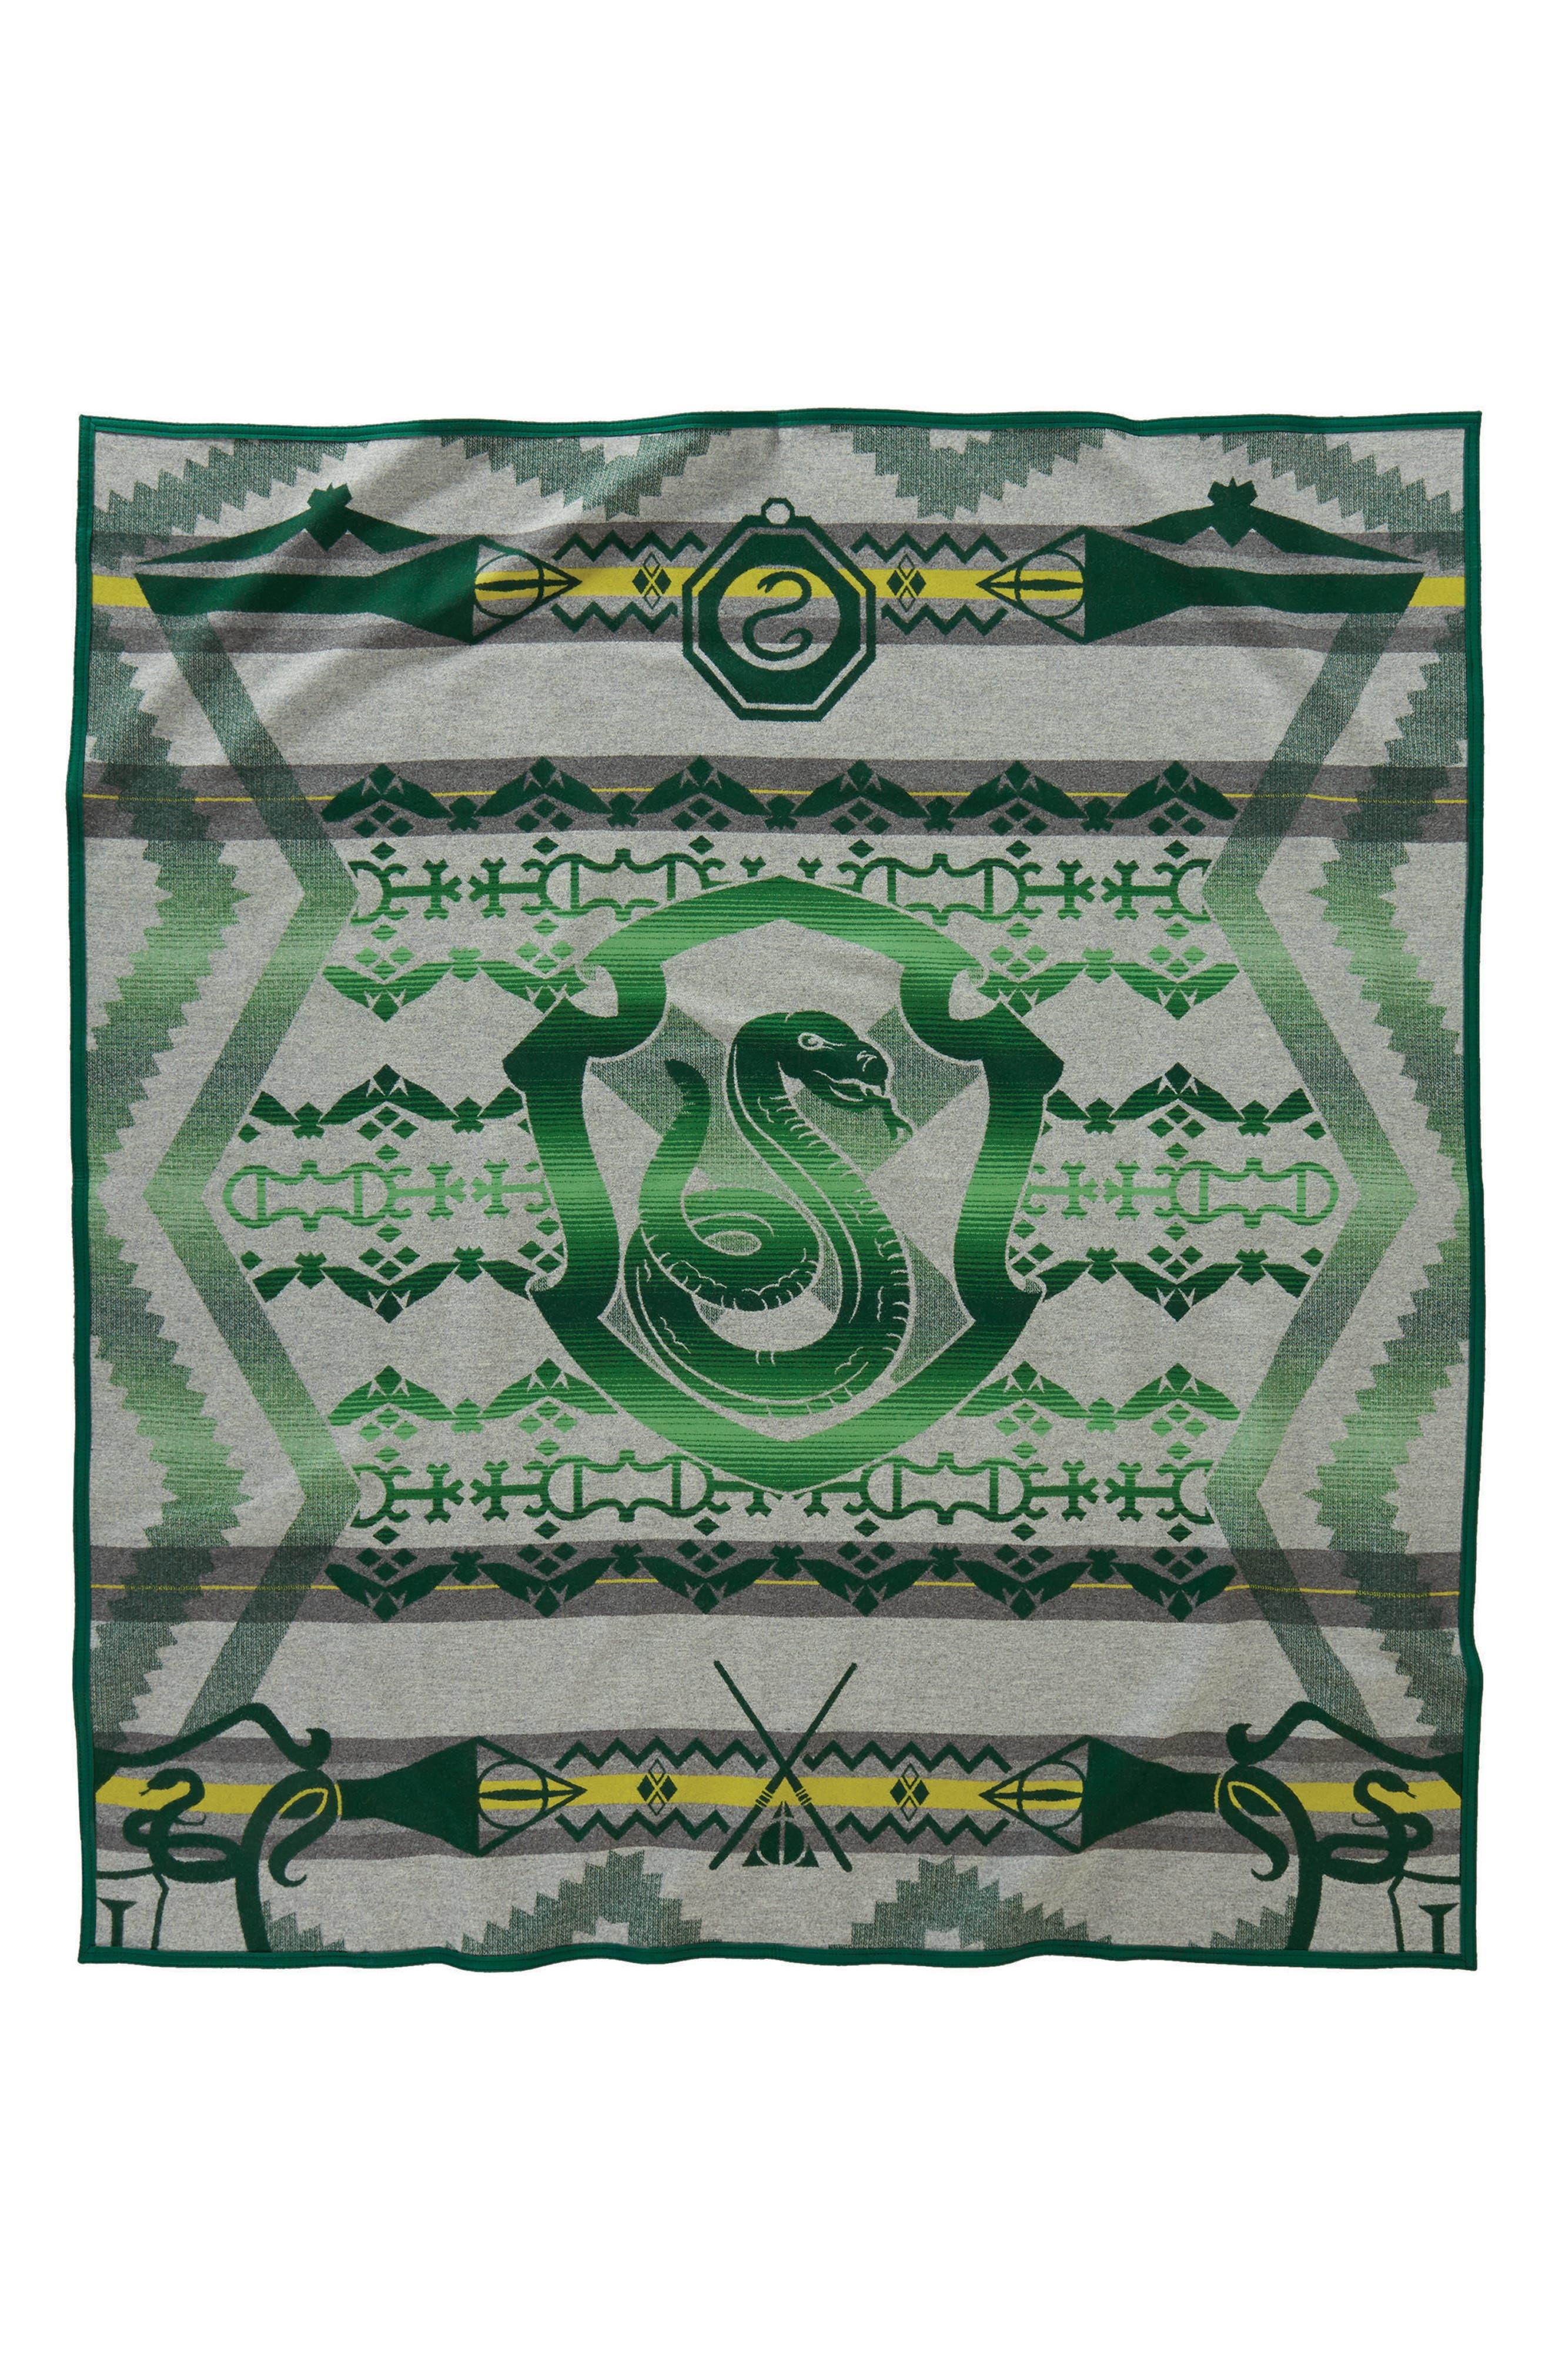 Harry Potter - Slytherin Blanket,                             Alternate thumbnail 2, color,                             Green